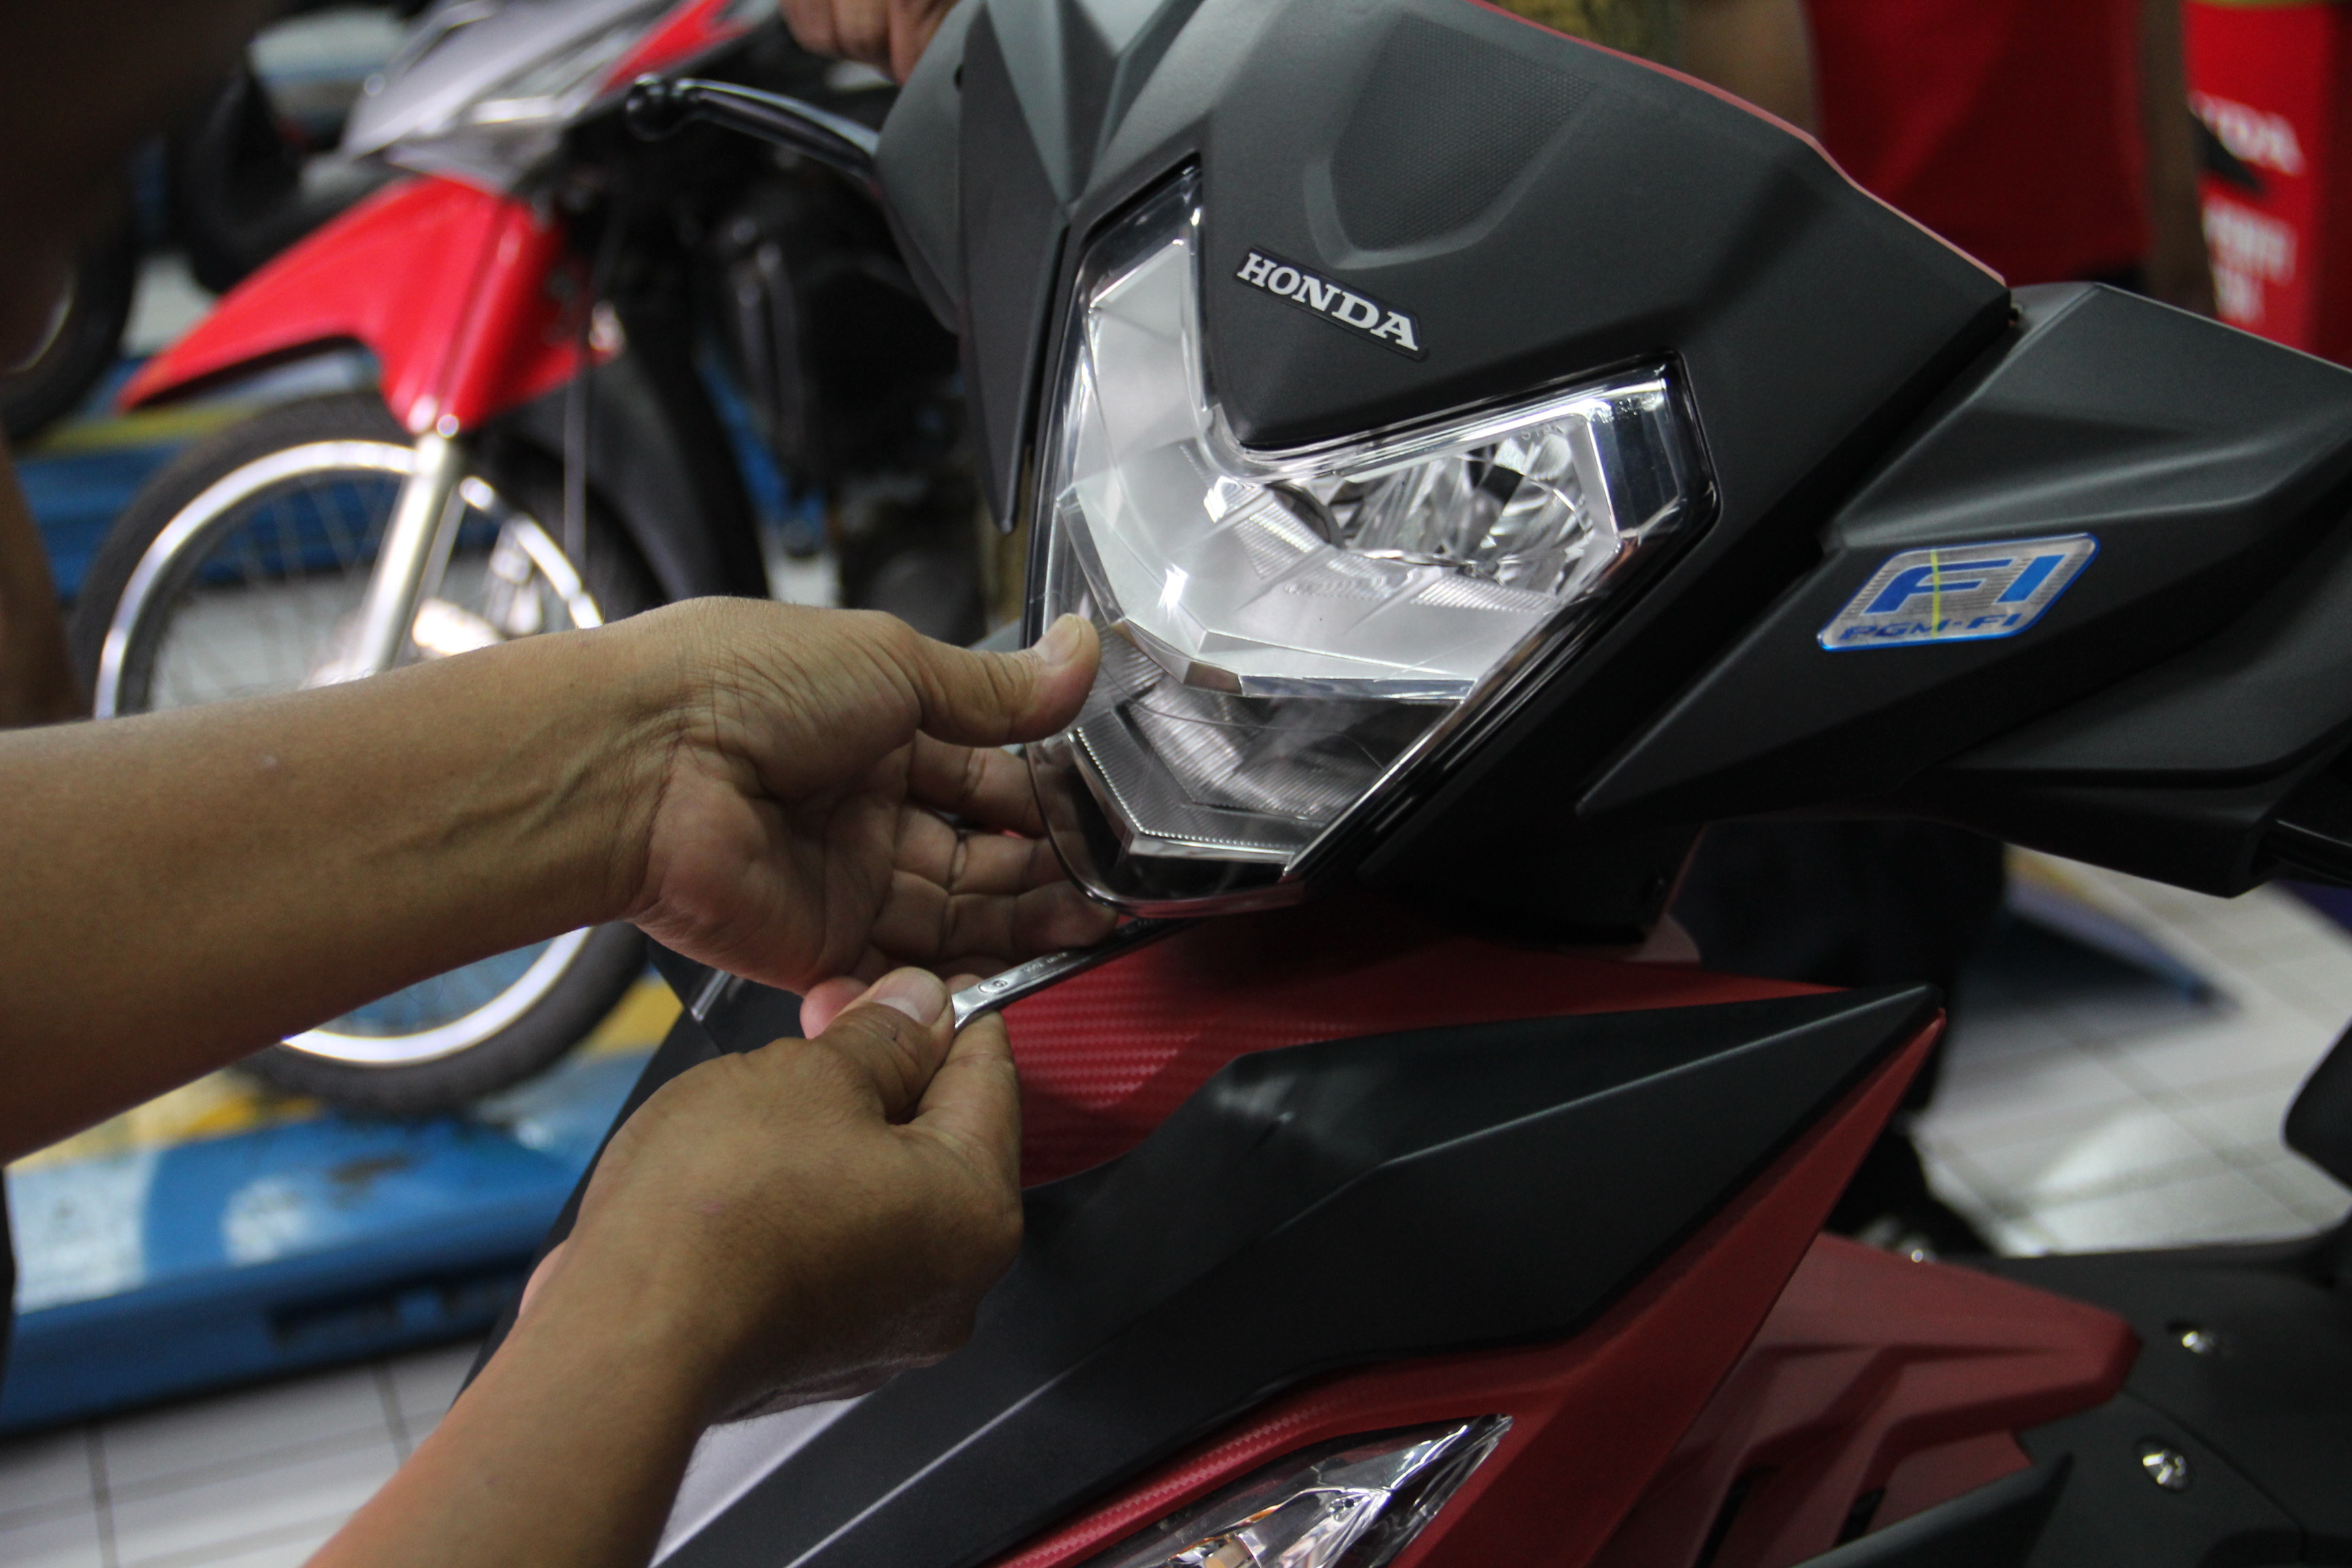 Yuk Setel Ketinggian Headlamp New Honda Sonic 150R Dan Supra GTR 150